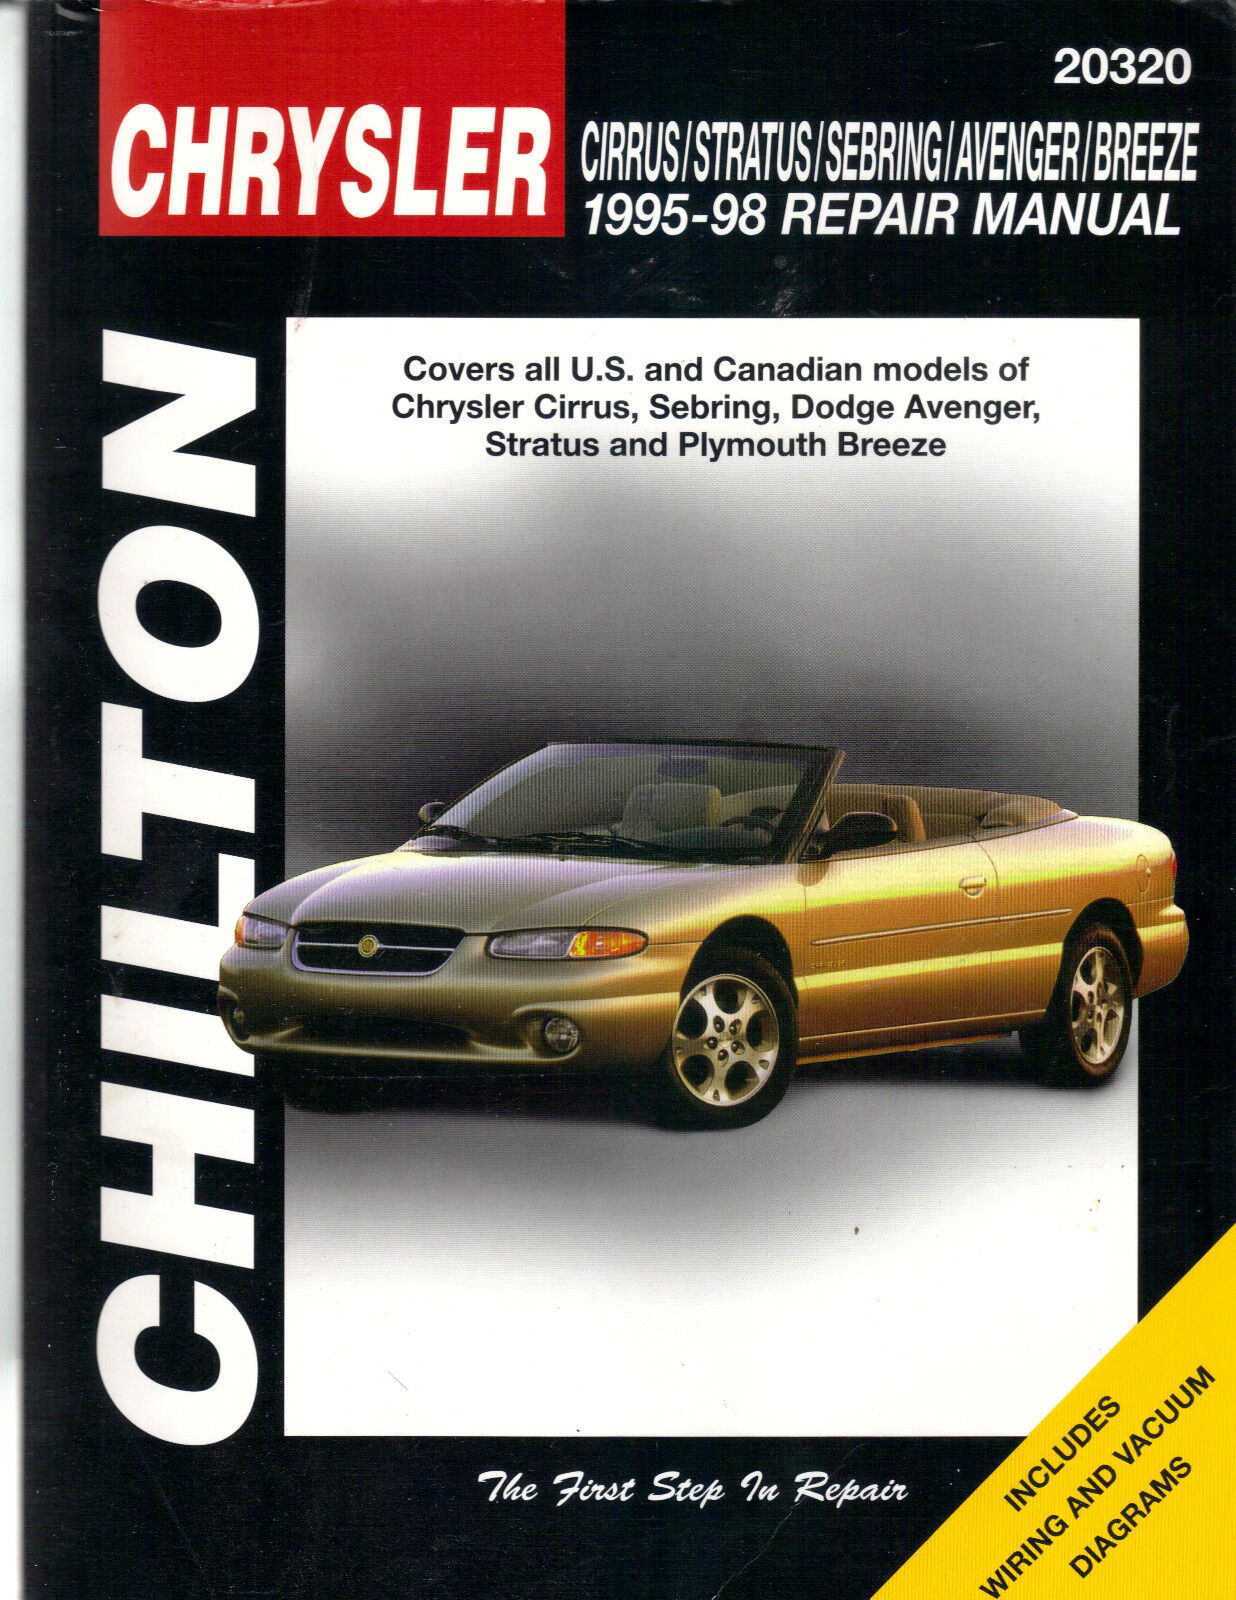 Chilton Manual 1995-1998 CHRYSLER Cirrus Sebring Dodge Avenger Stratus  Breeze | eBay